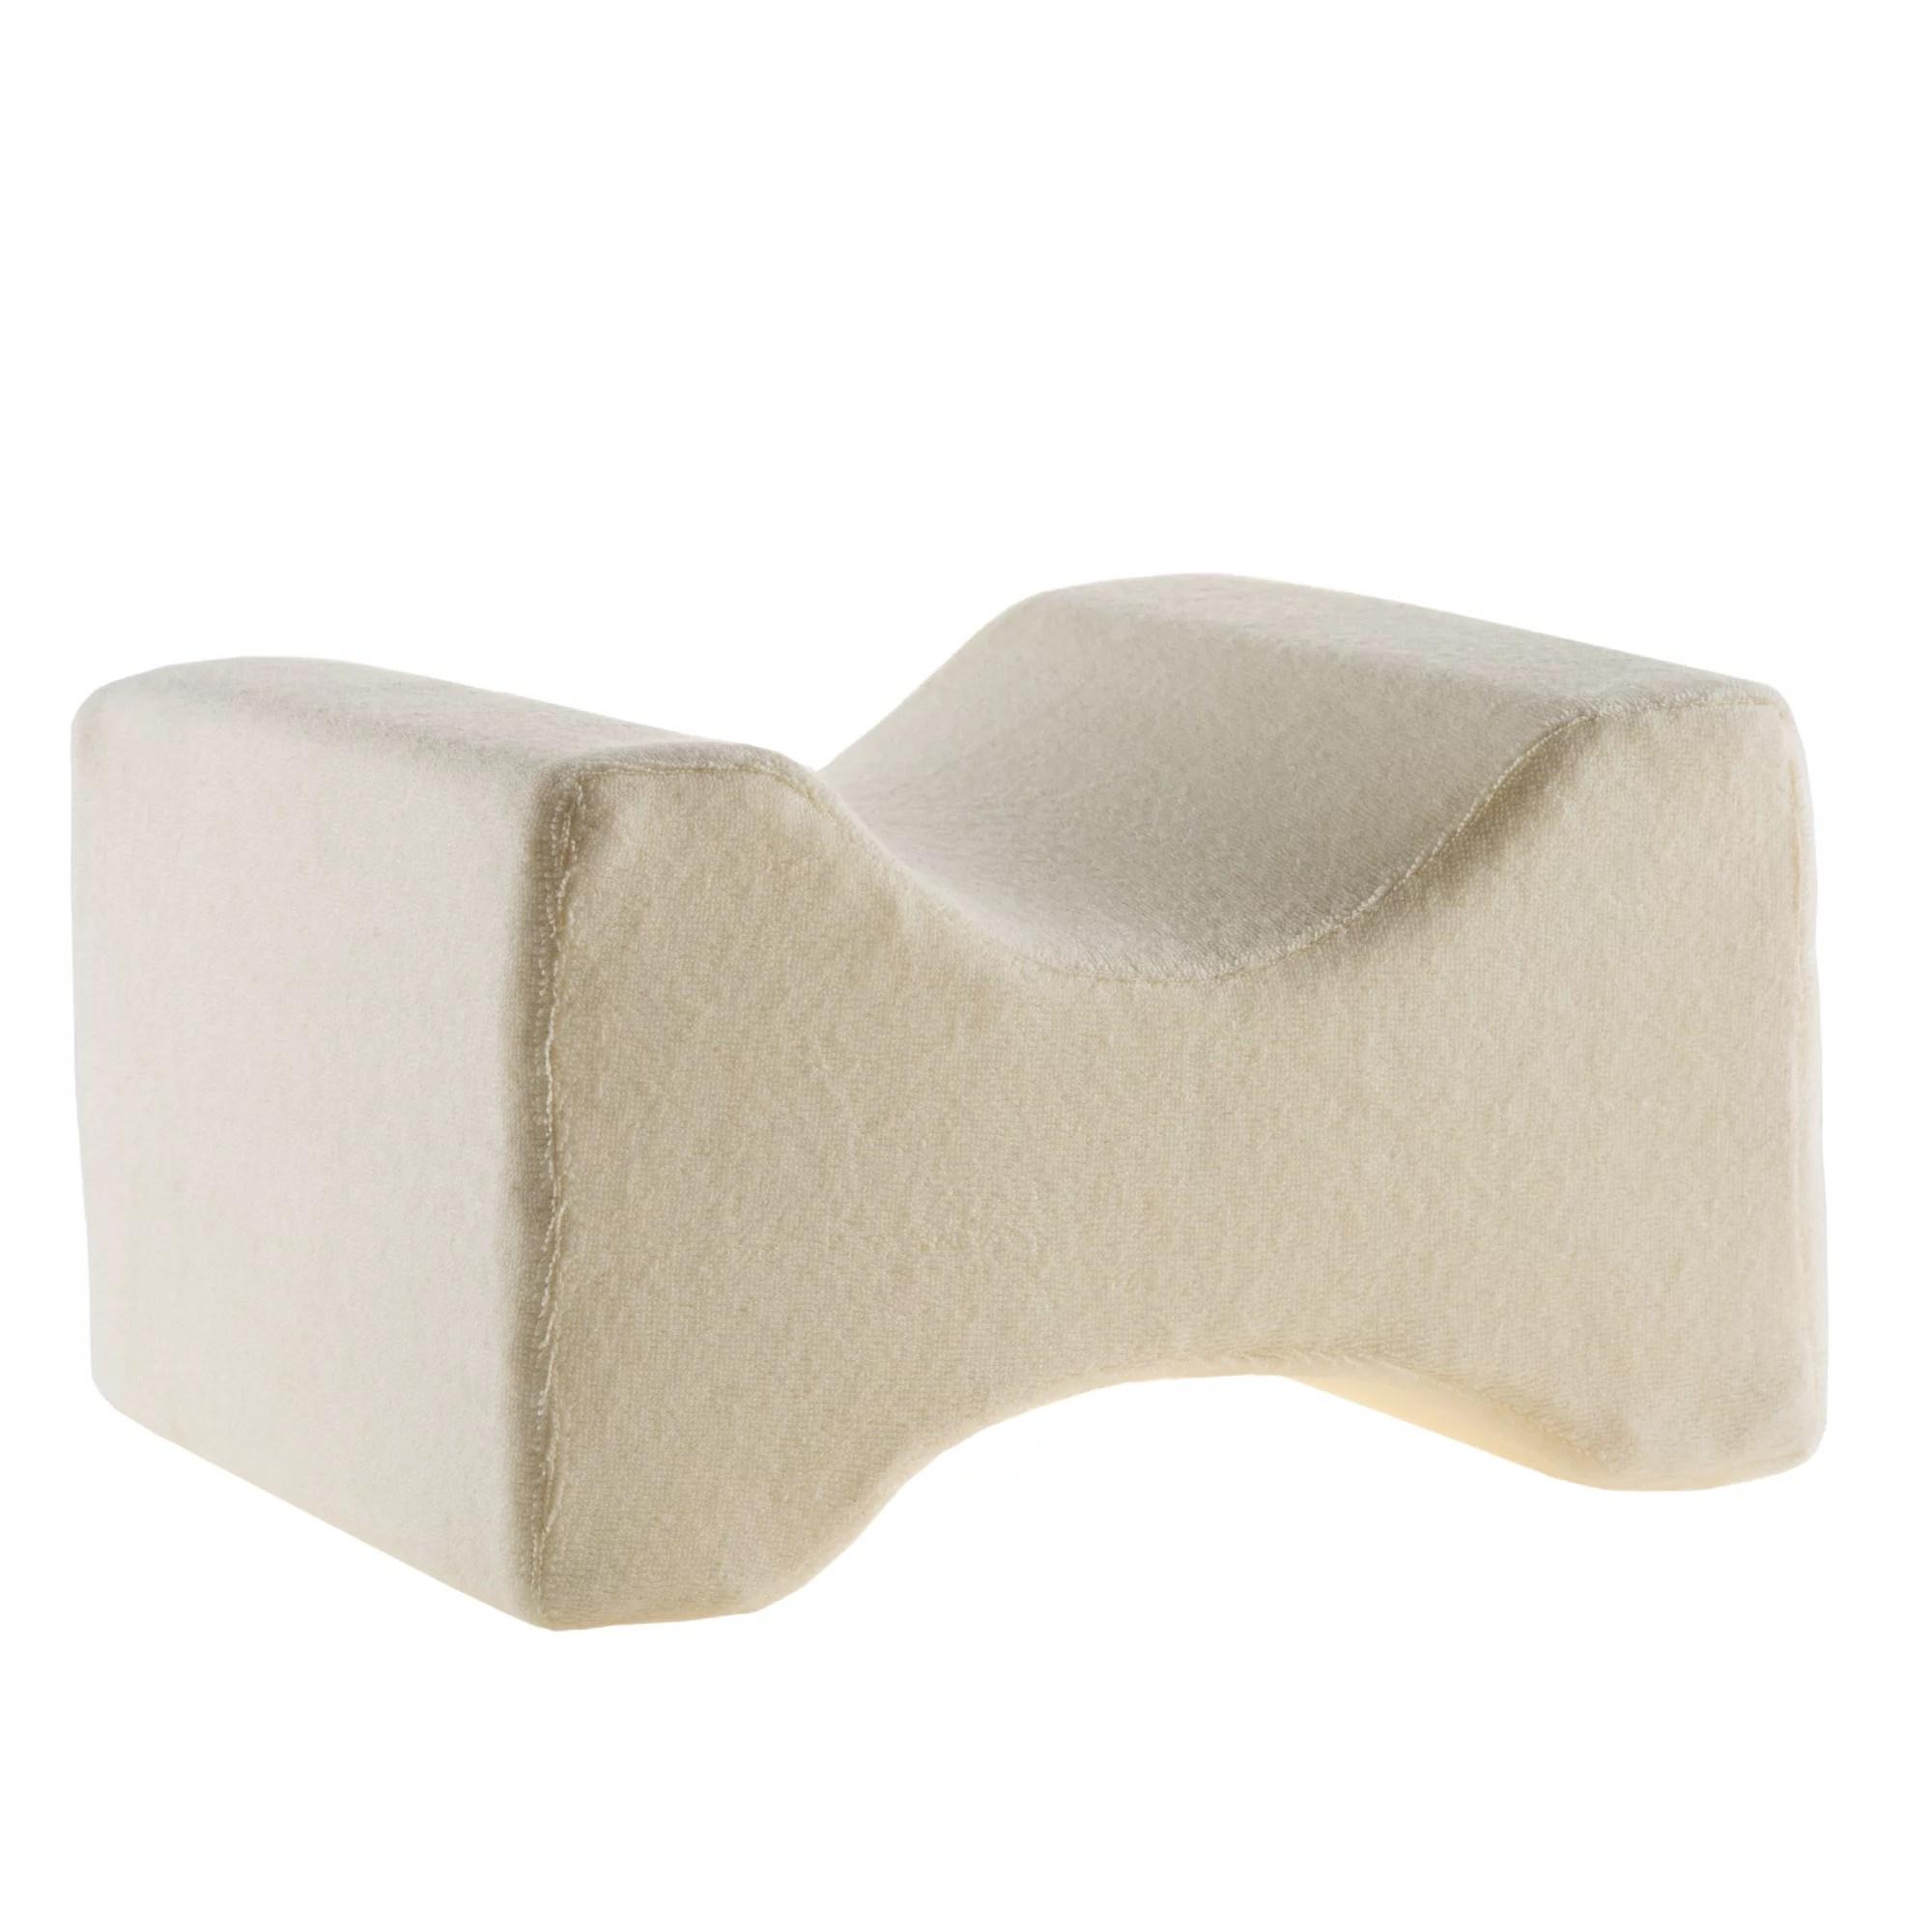 contoured orthopedic memory foam leg pillow by somerset home walmart com